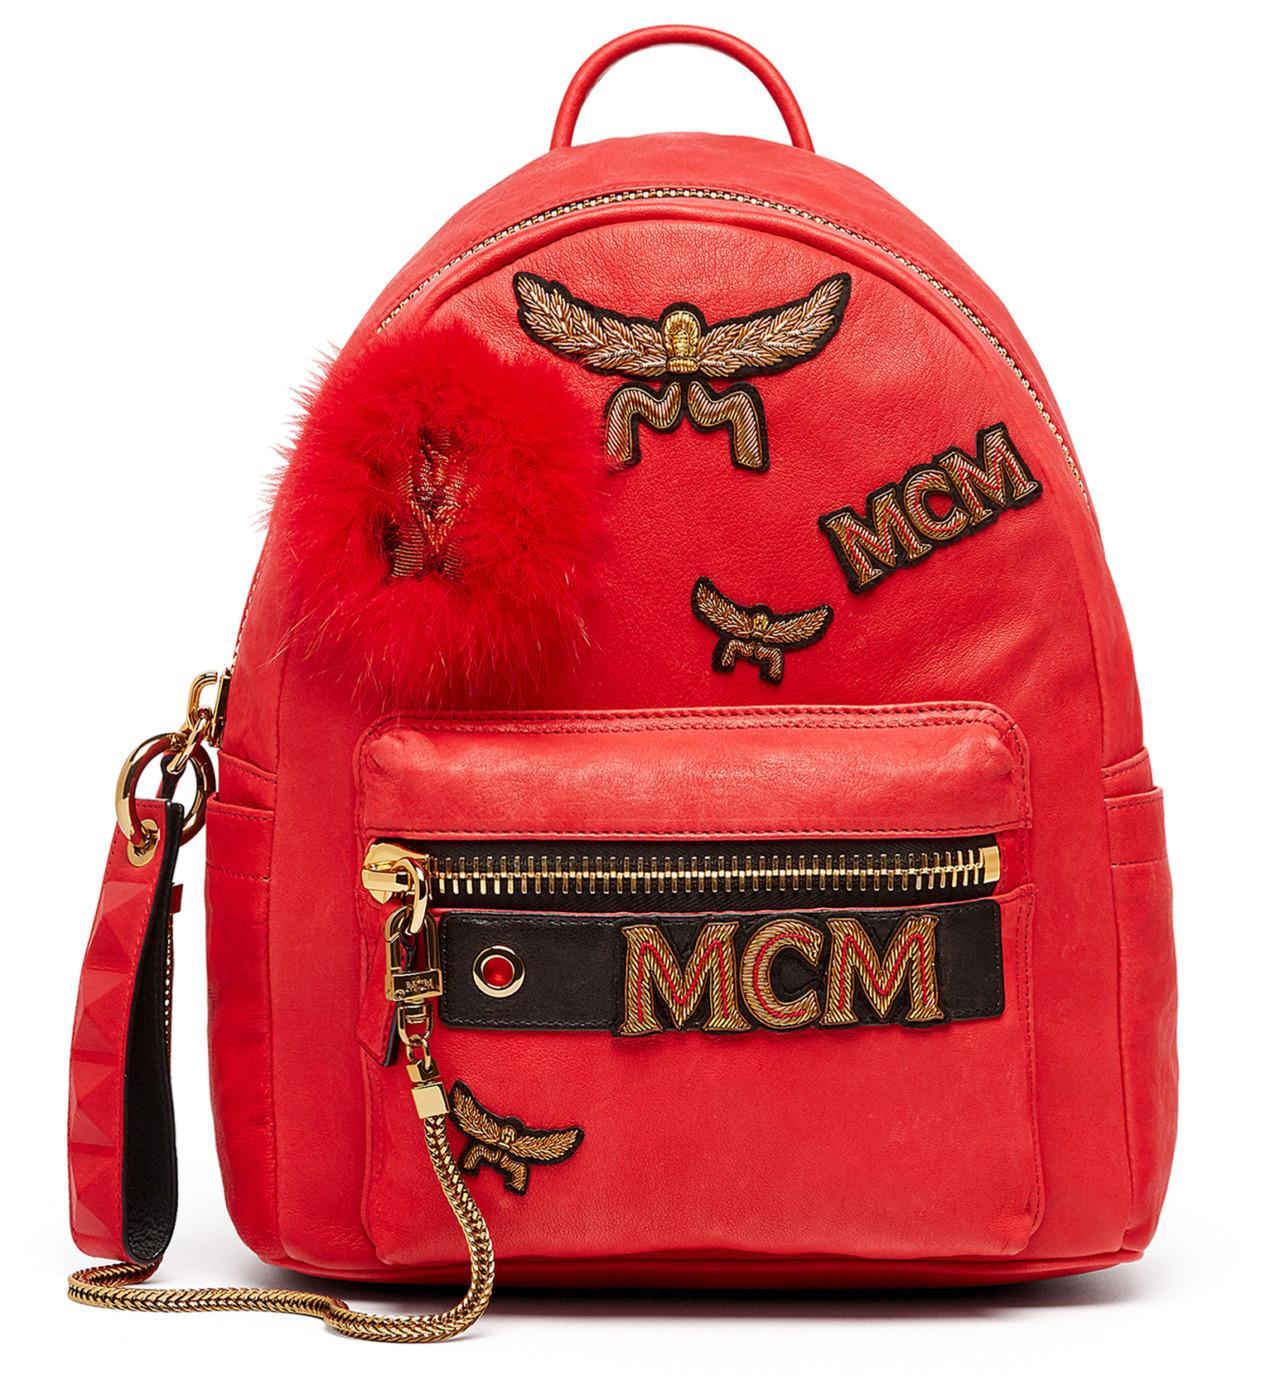 6acc3c8c0 MCM Red Stark Leather & Genuine Lamb Fur Insignia Small ...